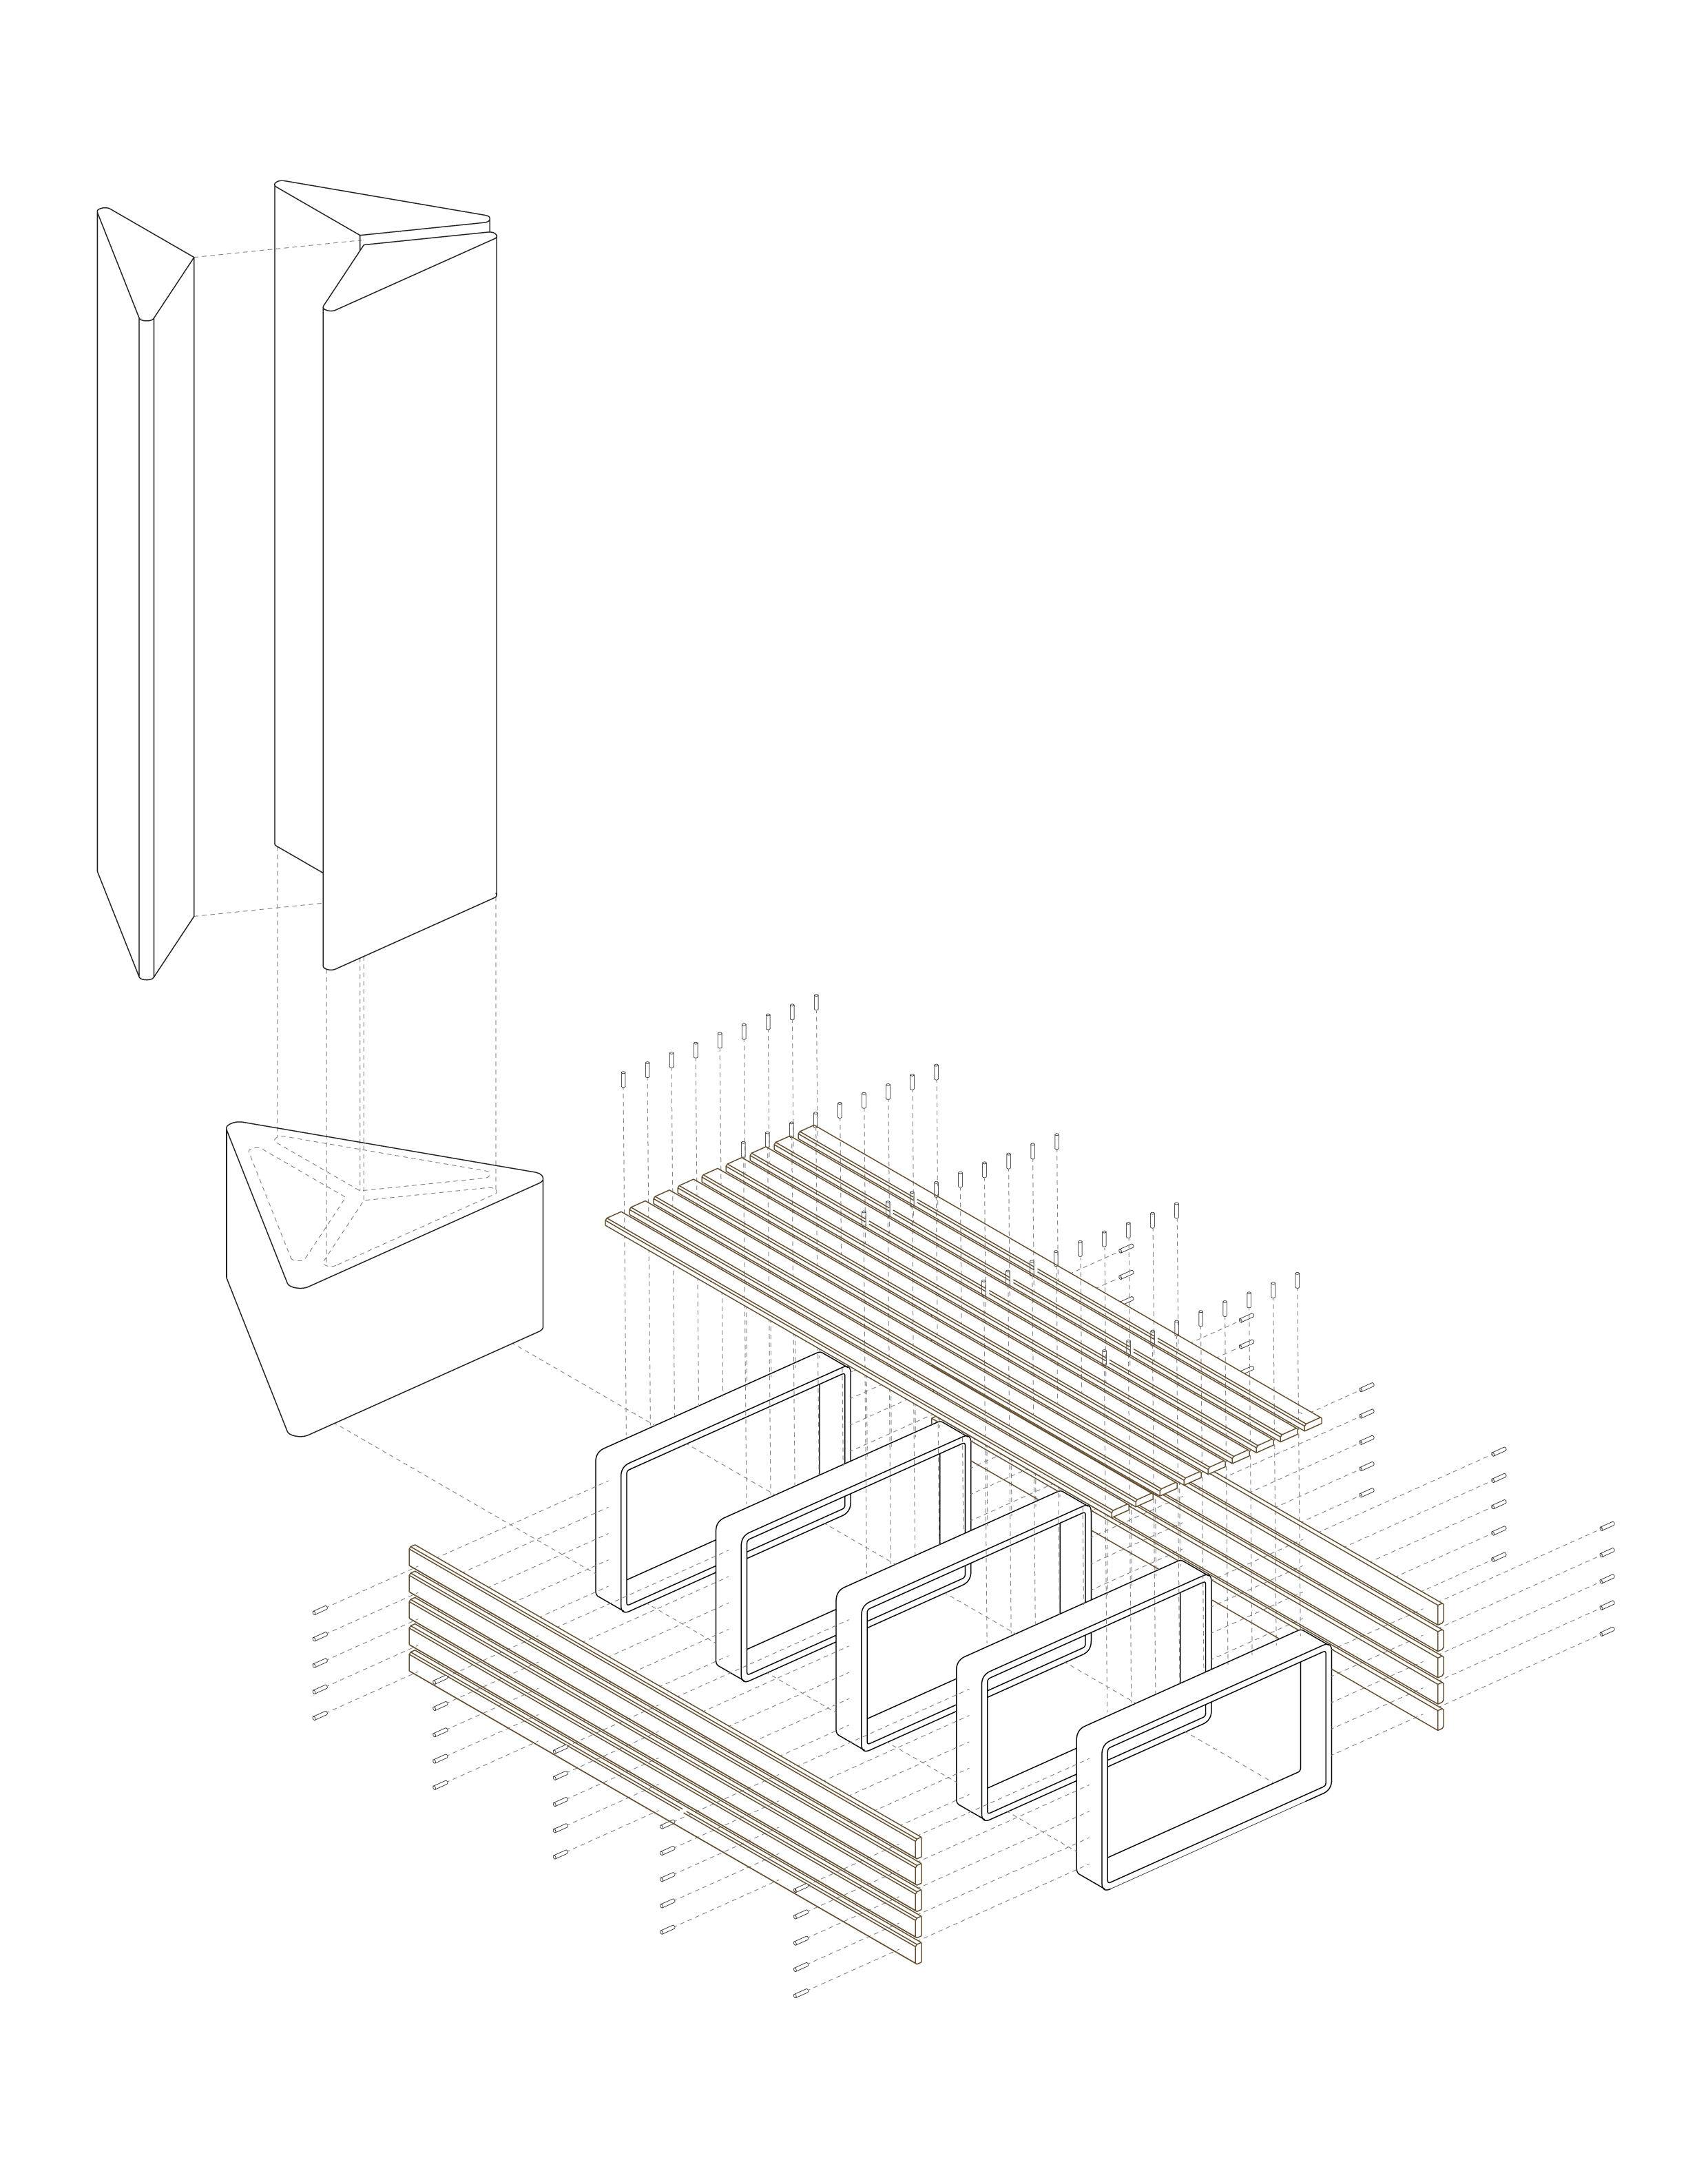 BENCH CONSTRUCTION